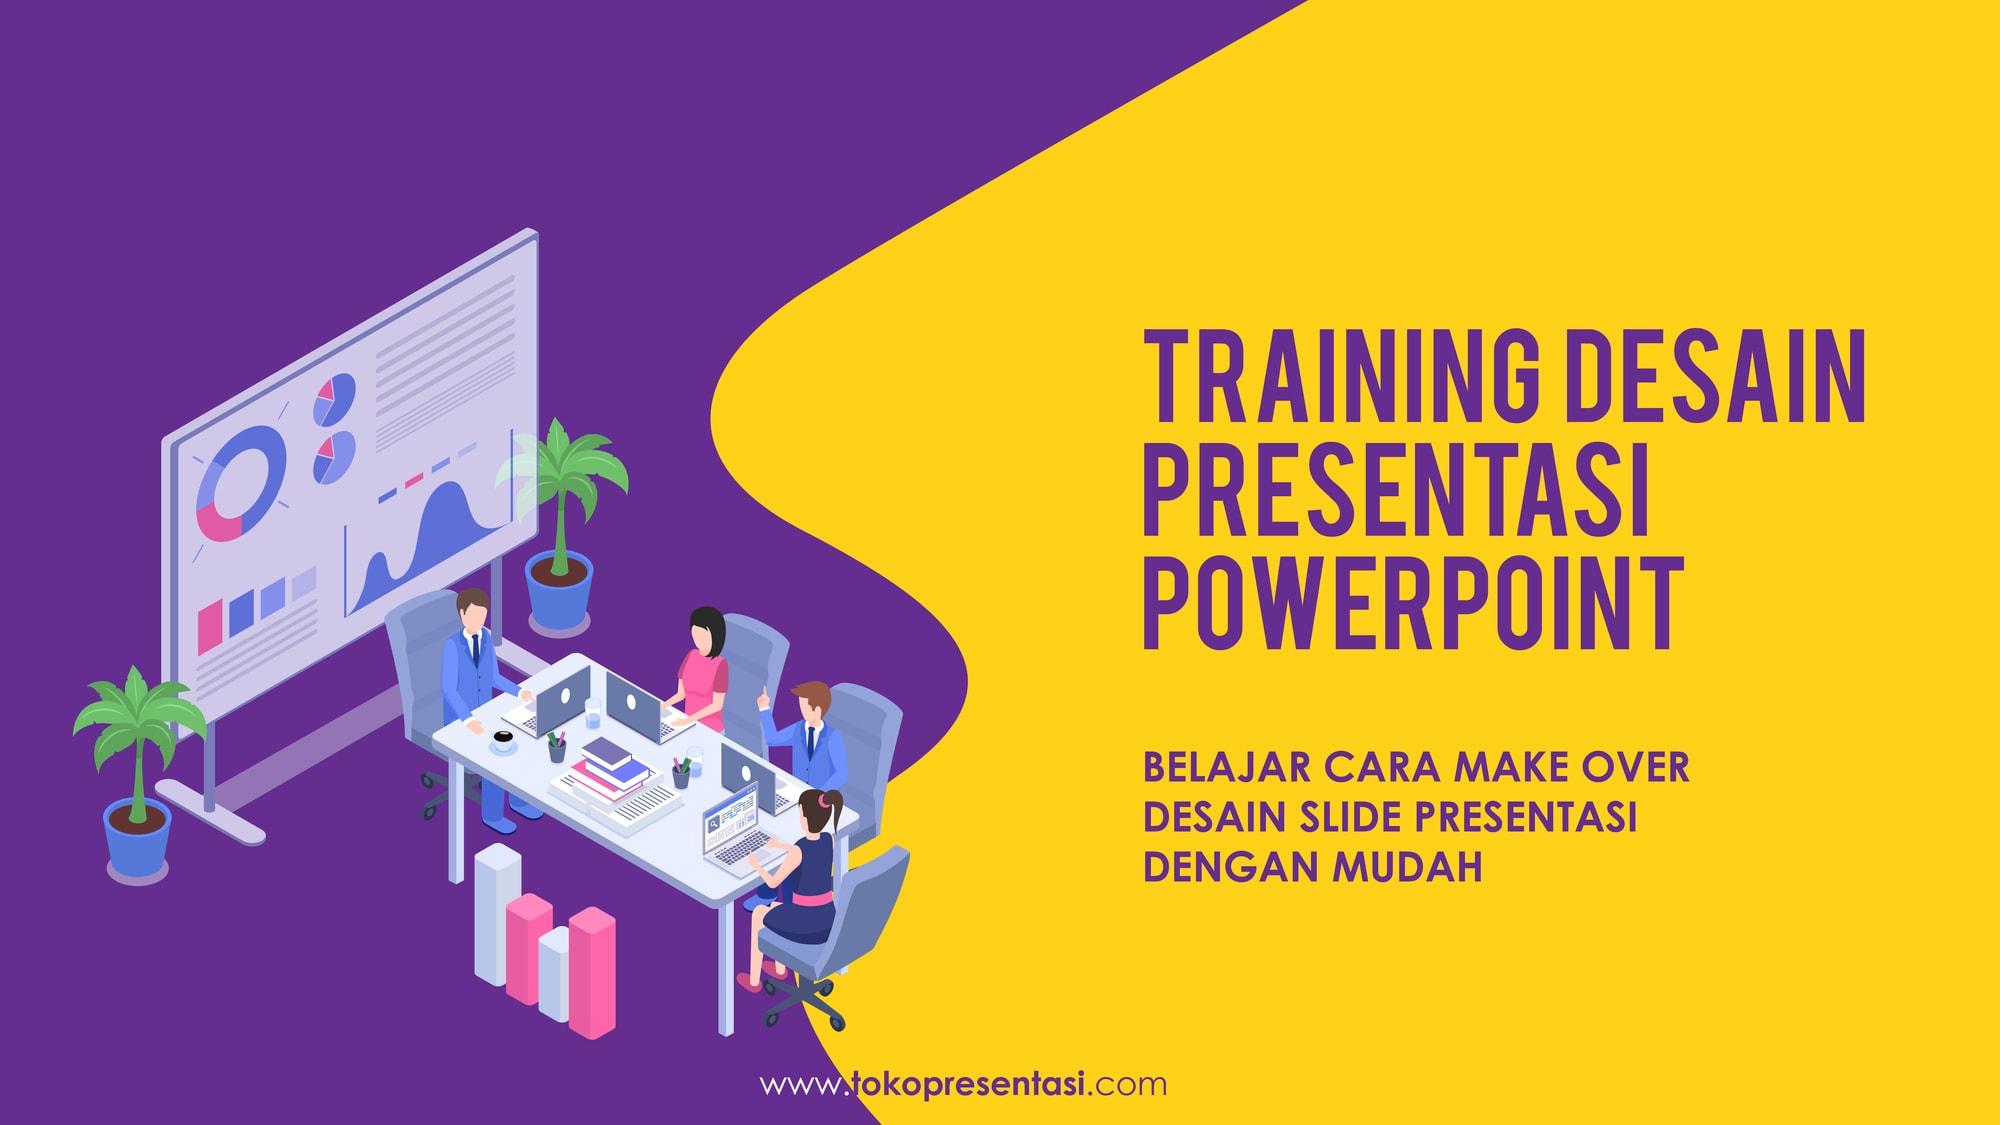 Training Desain PowerPoint PPT Lembaga Perlindungan Saksi dan Korban (LPSK) Tokopresentasi